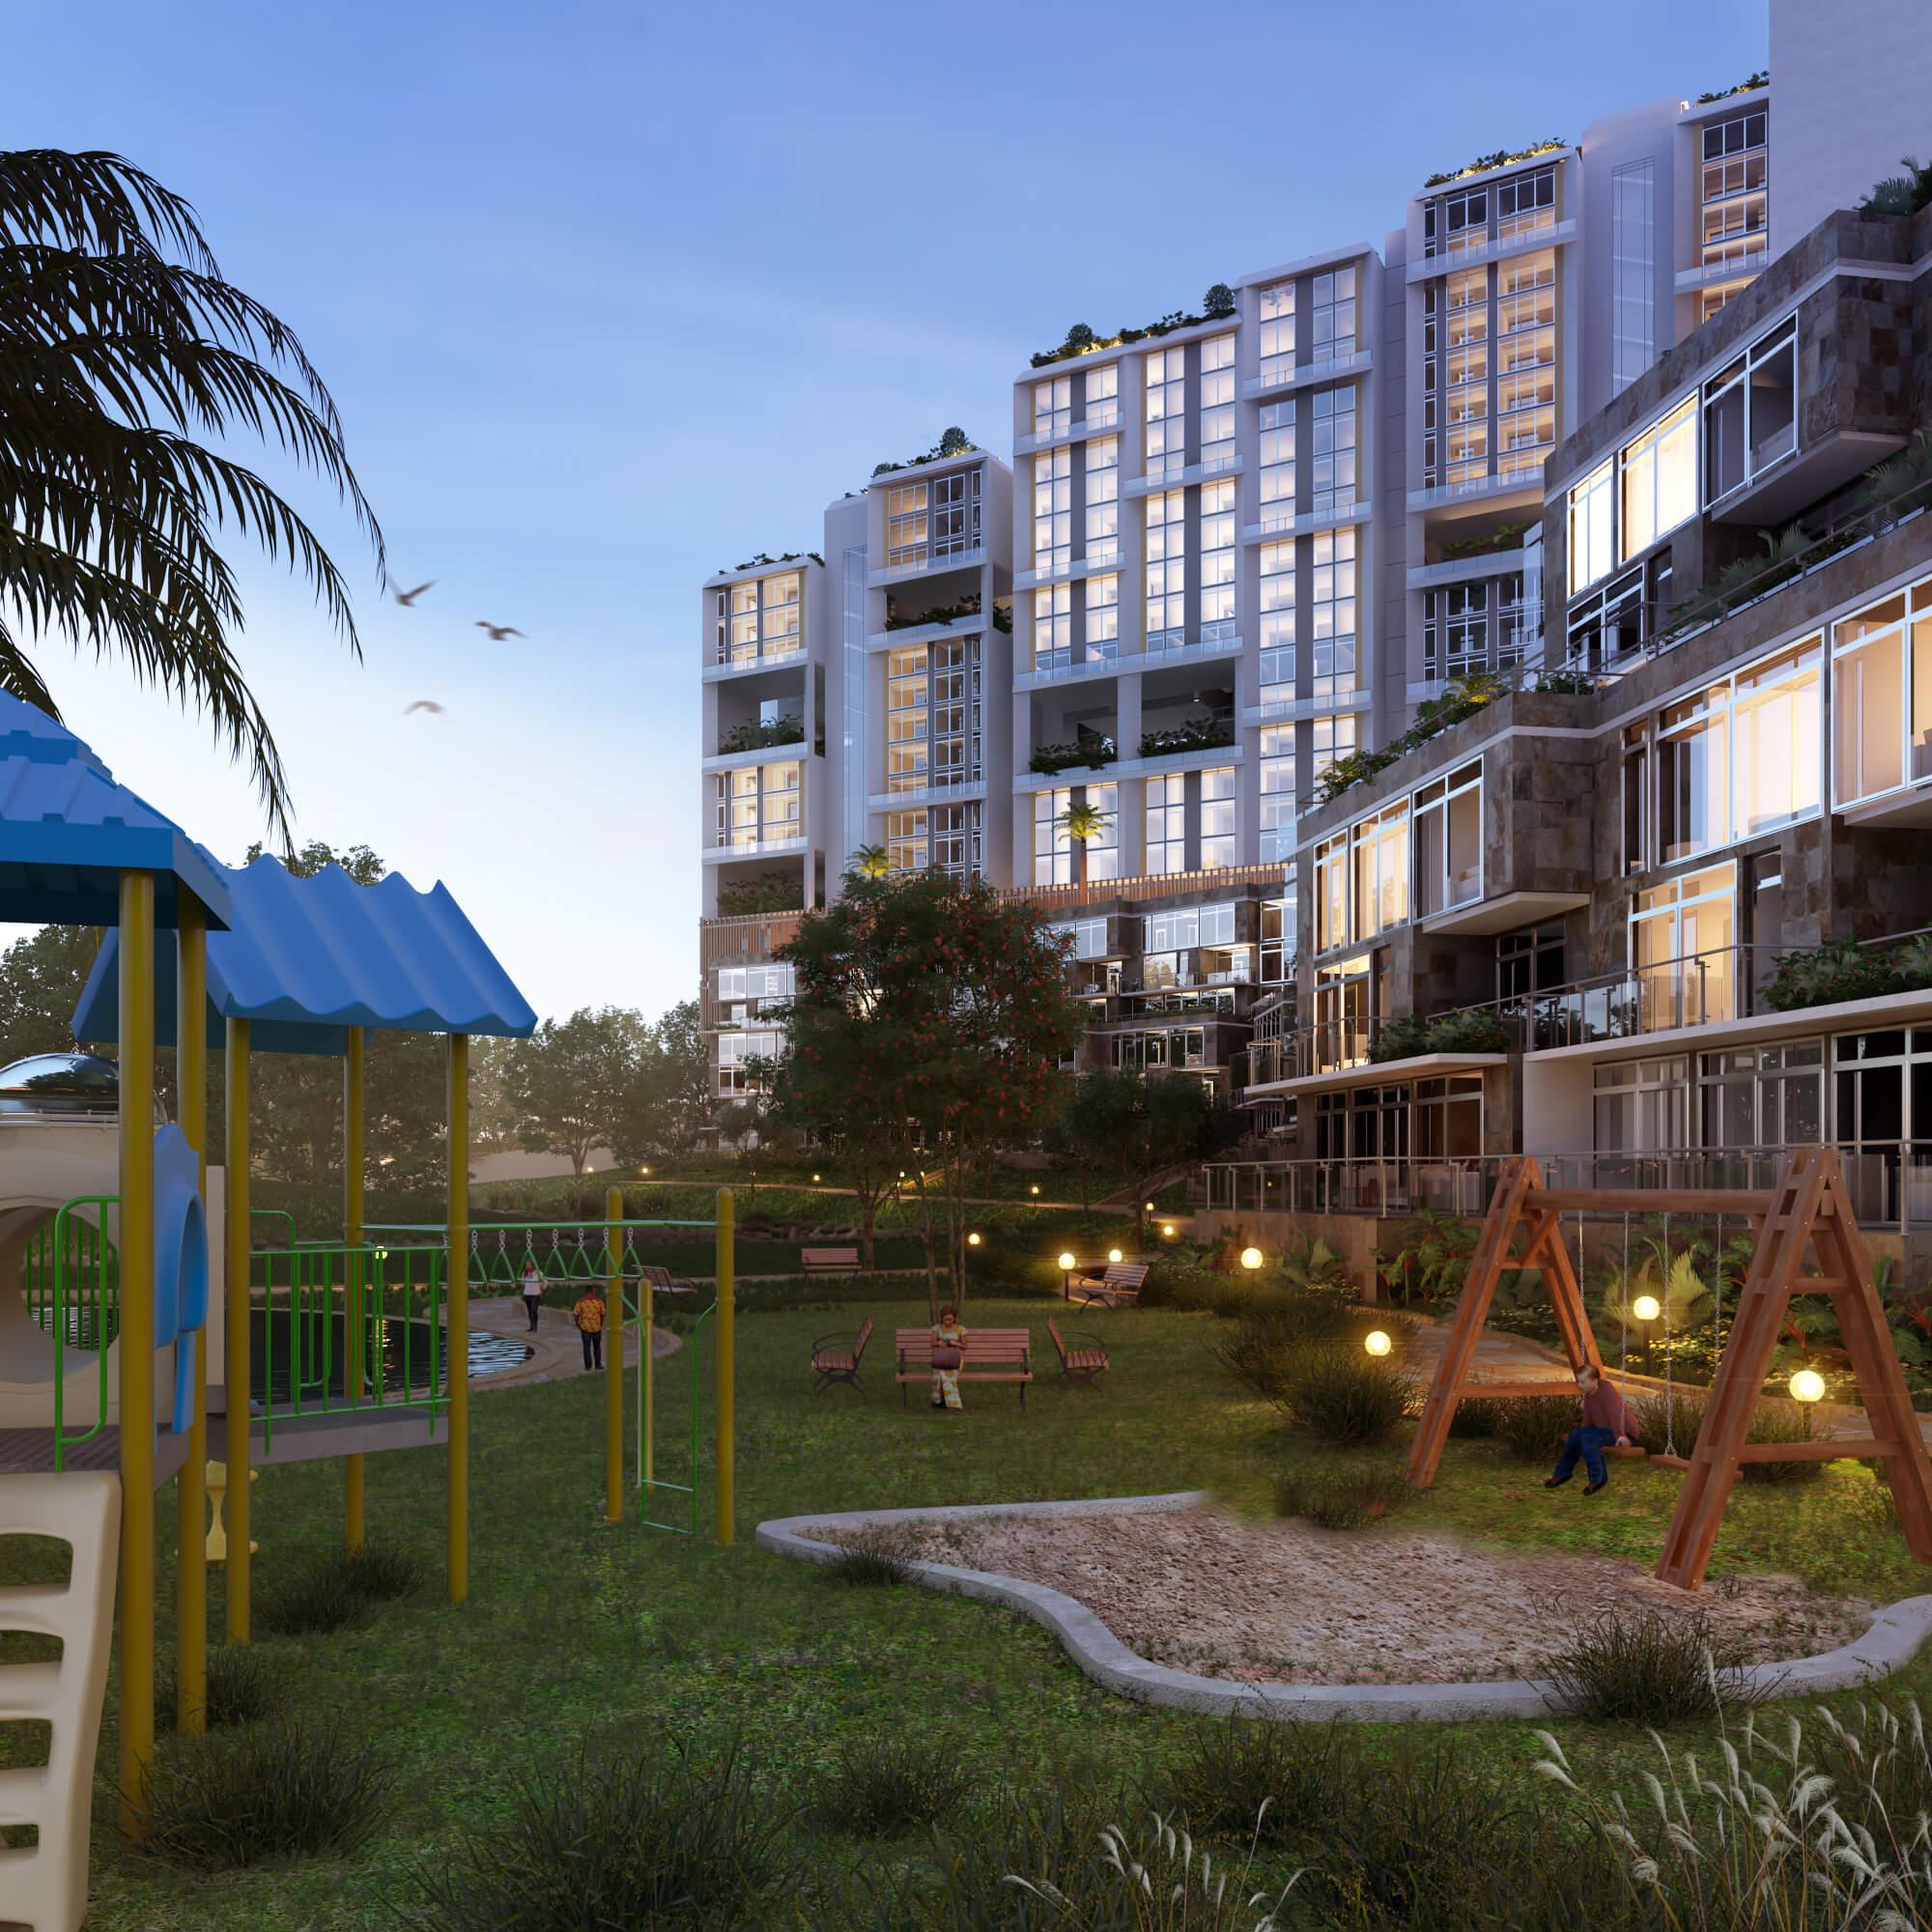 Cascadia Apartments For Sale, Runda